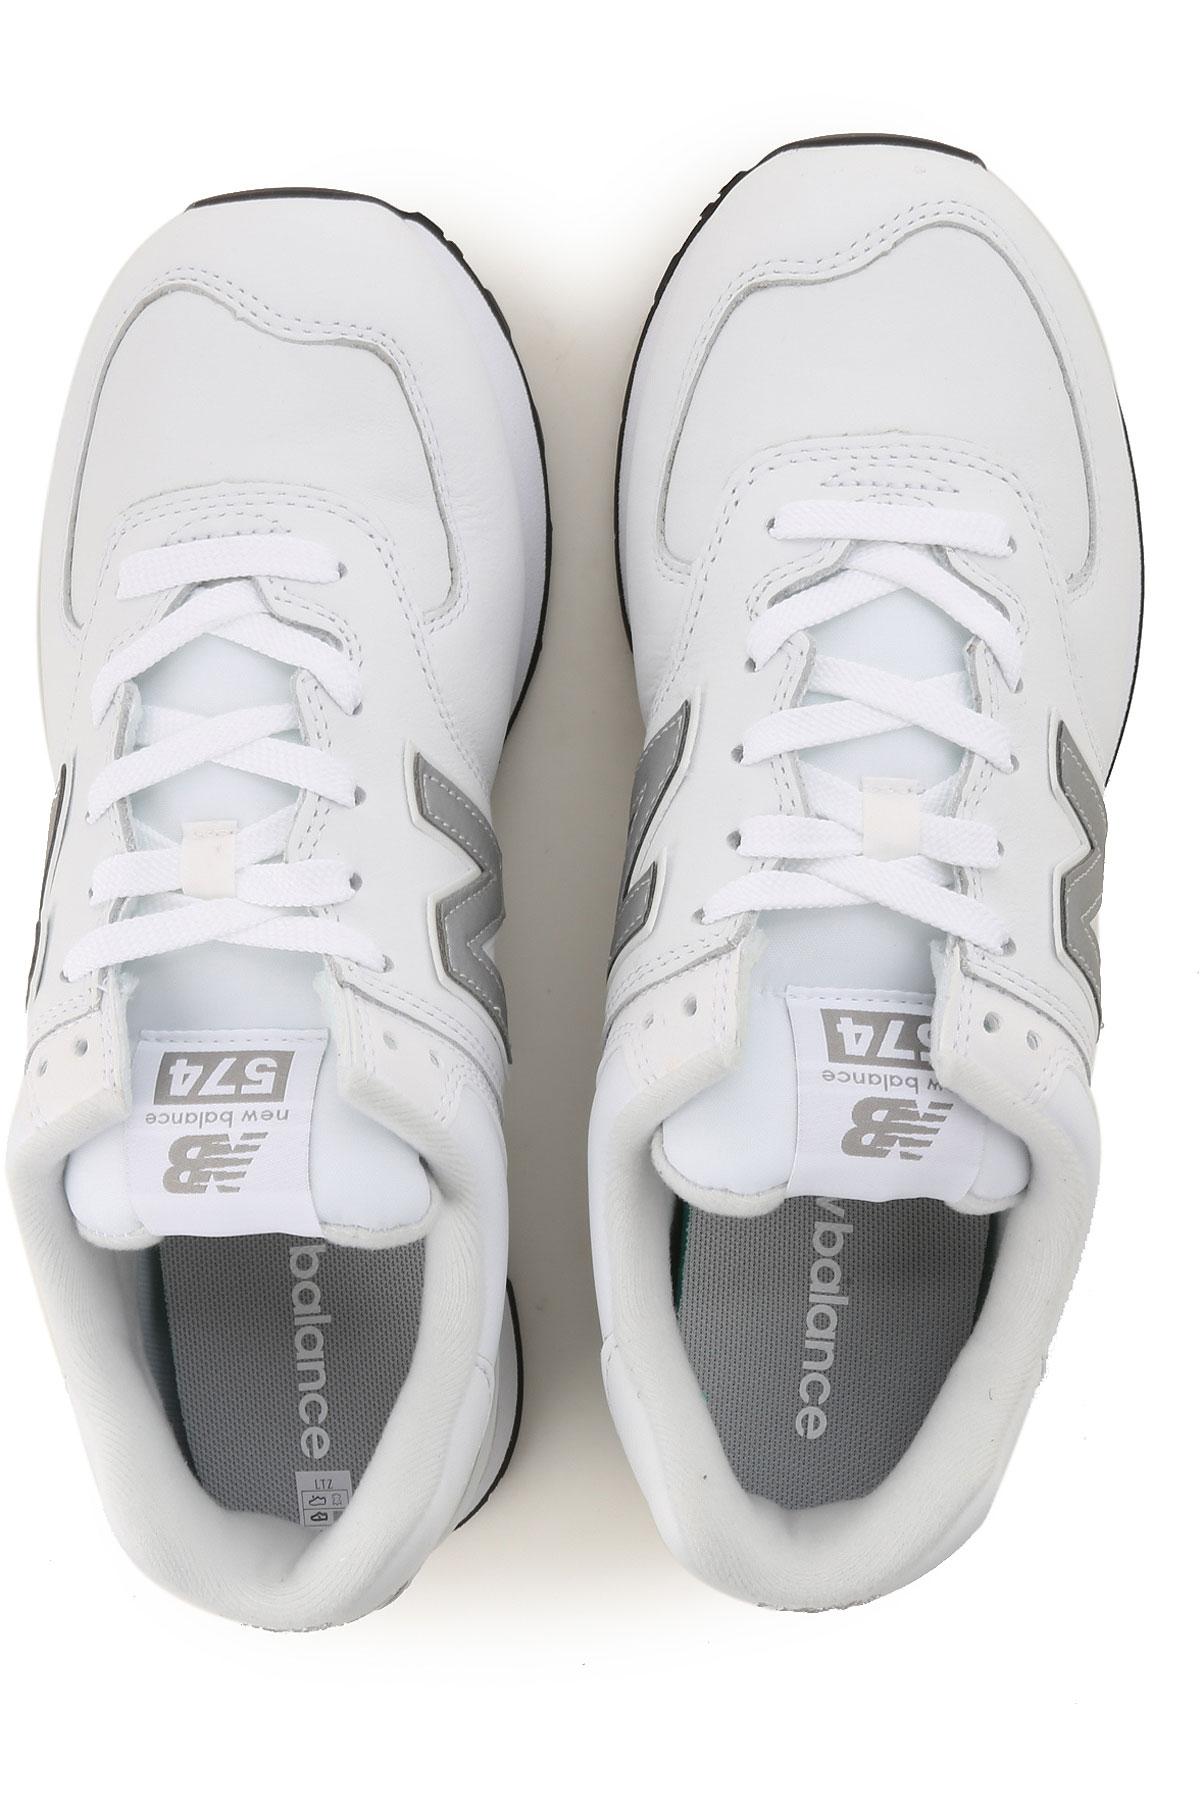 nbsp;negro Zapatos Plata Blanco Balance invierno Para Hombres New 19 2018 Otoño v14qw45